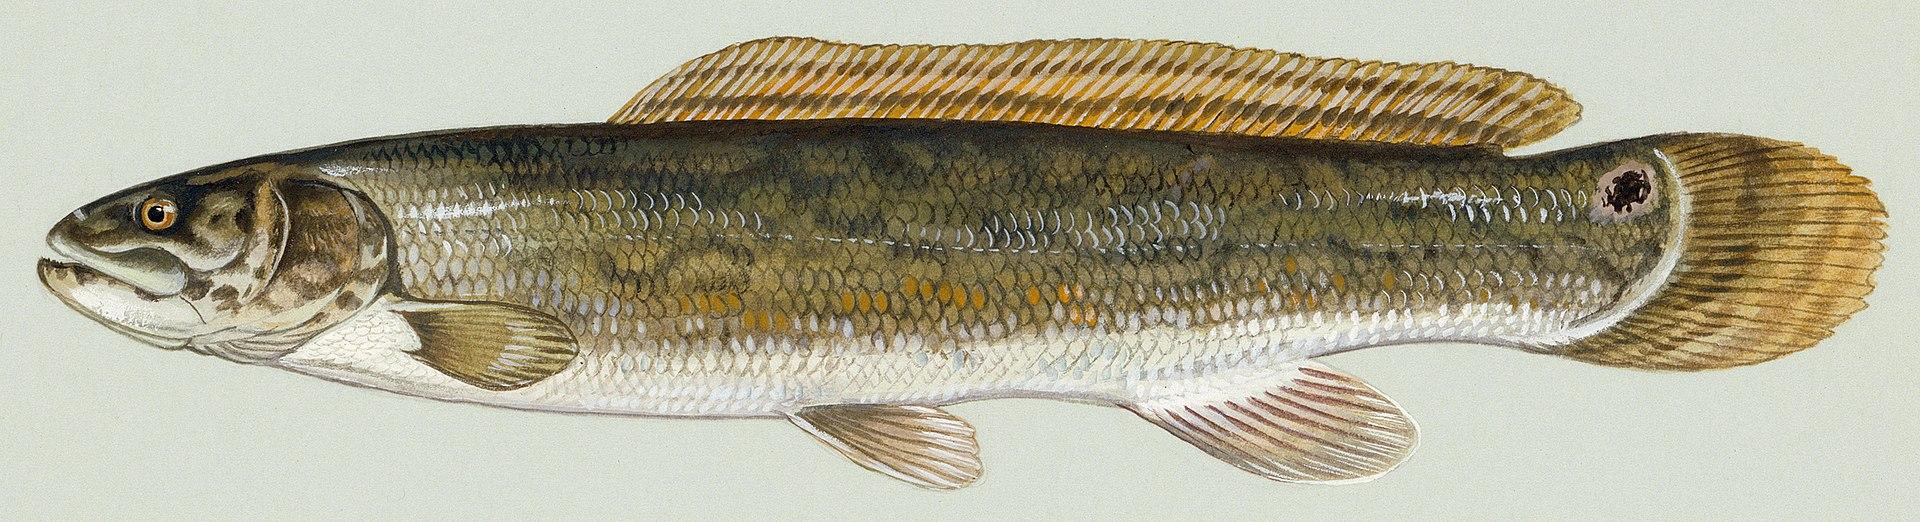 Spearfishing for tx non game fish aka carp for Texas non game fish